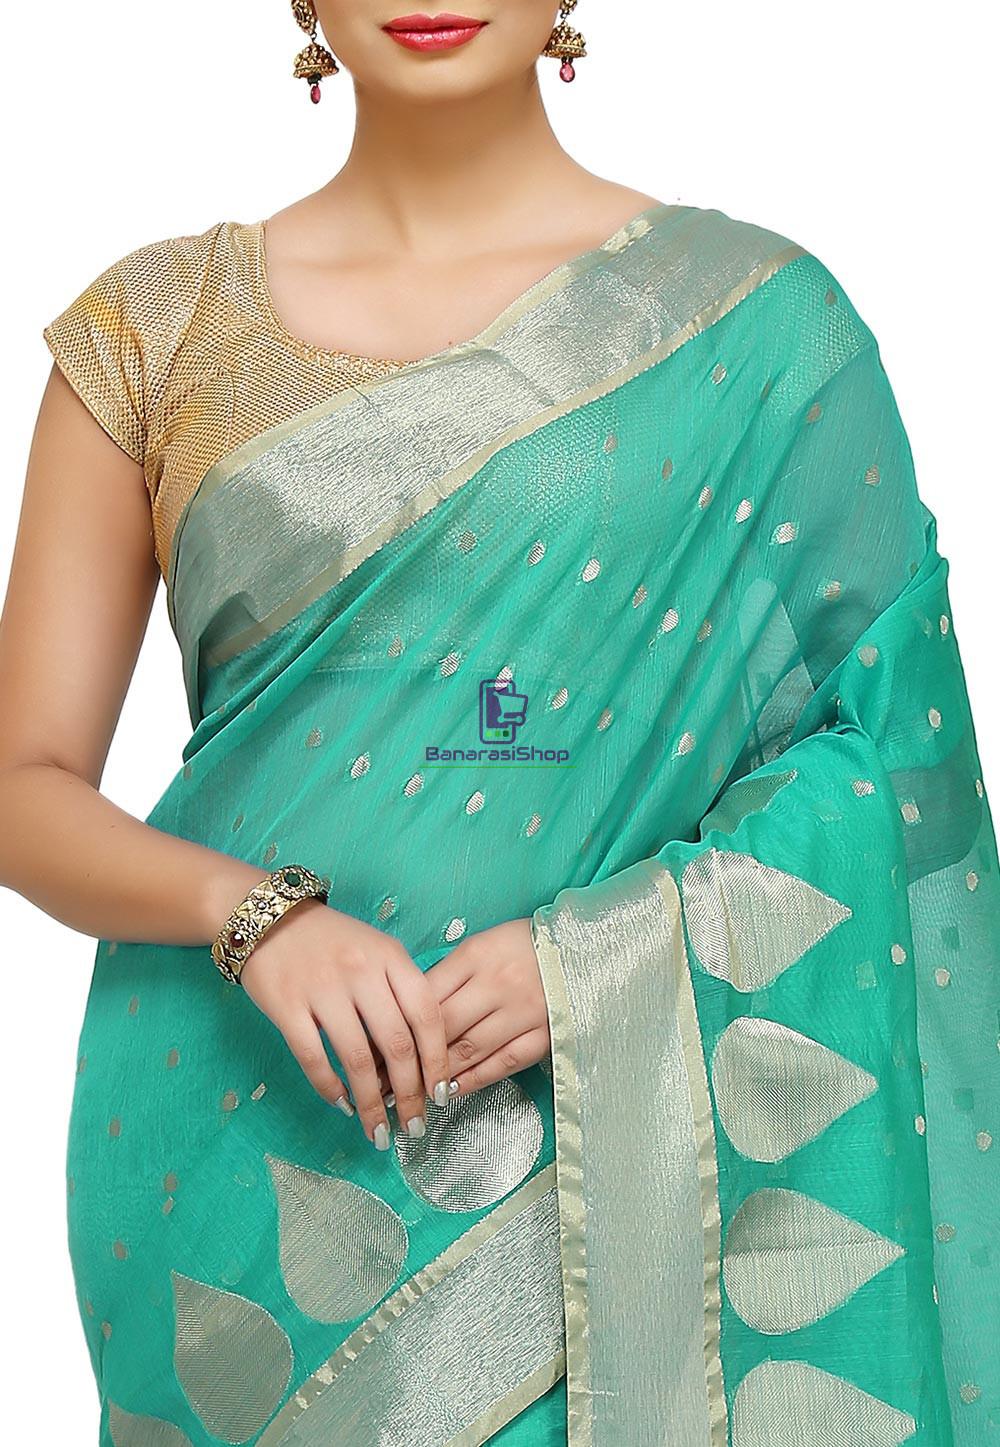 Woven Banarasi Cotton Silk Saree in Teal Green 2